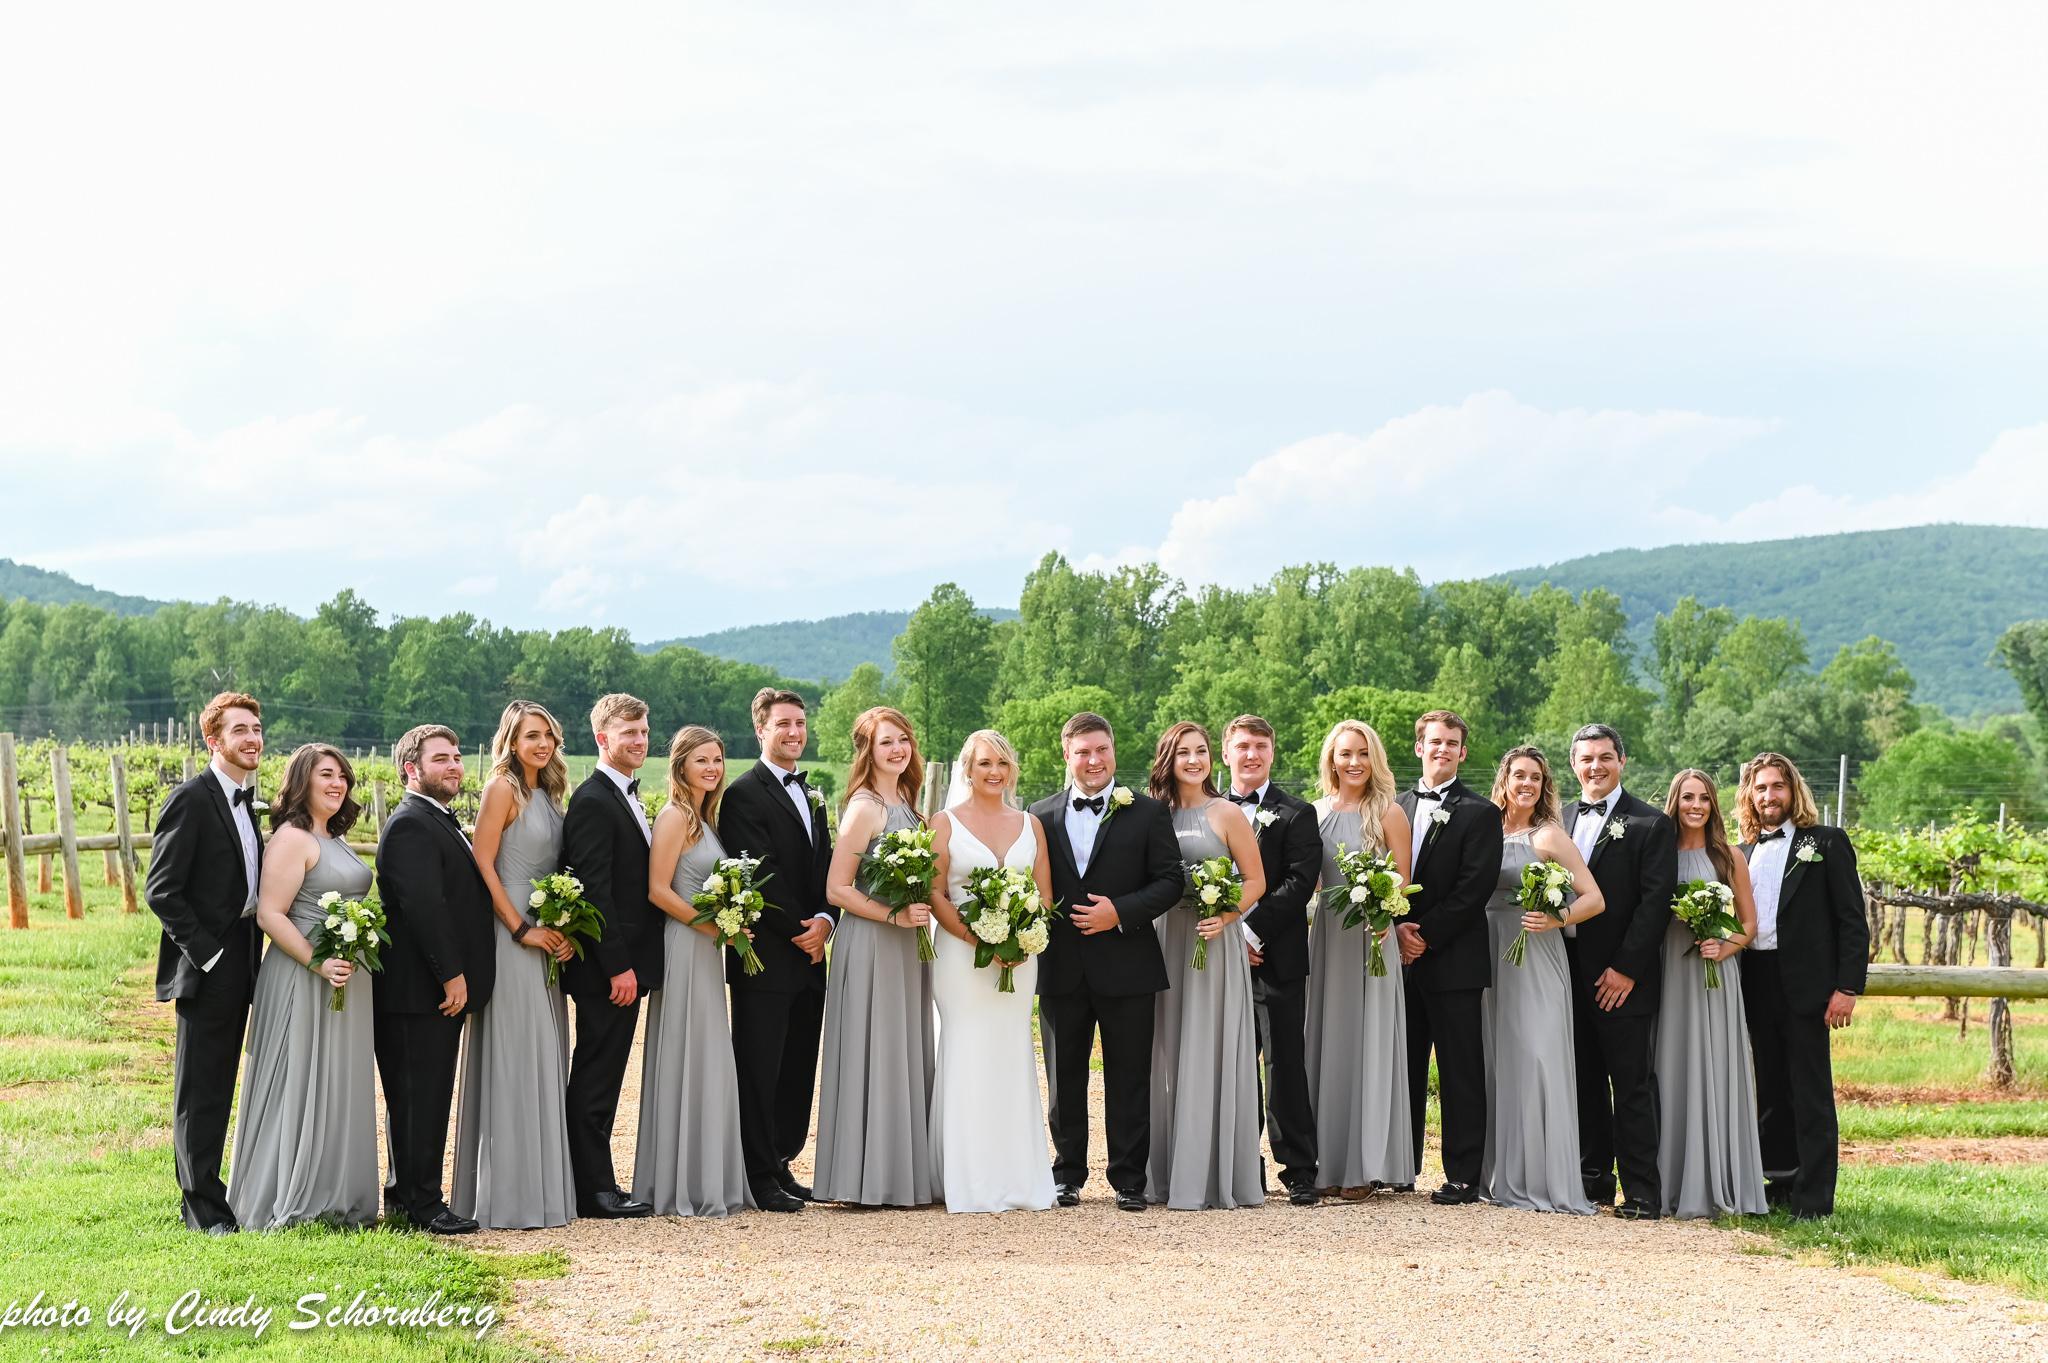 Charlottesville_Wedding_08.jpg